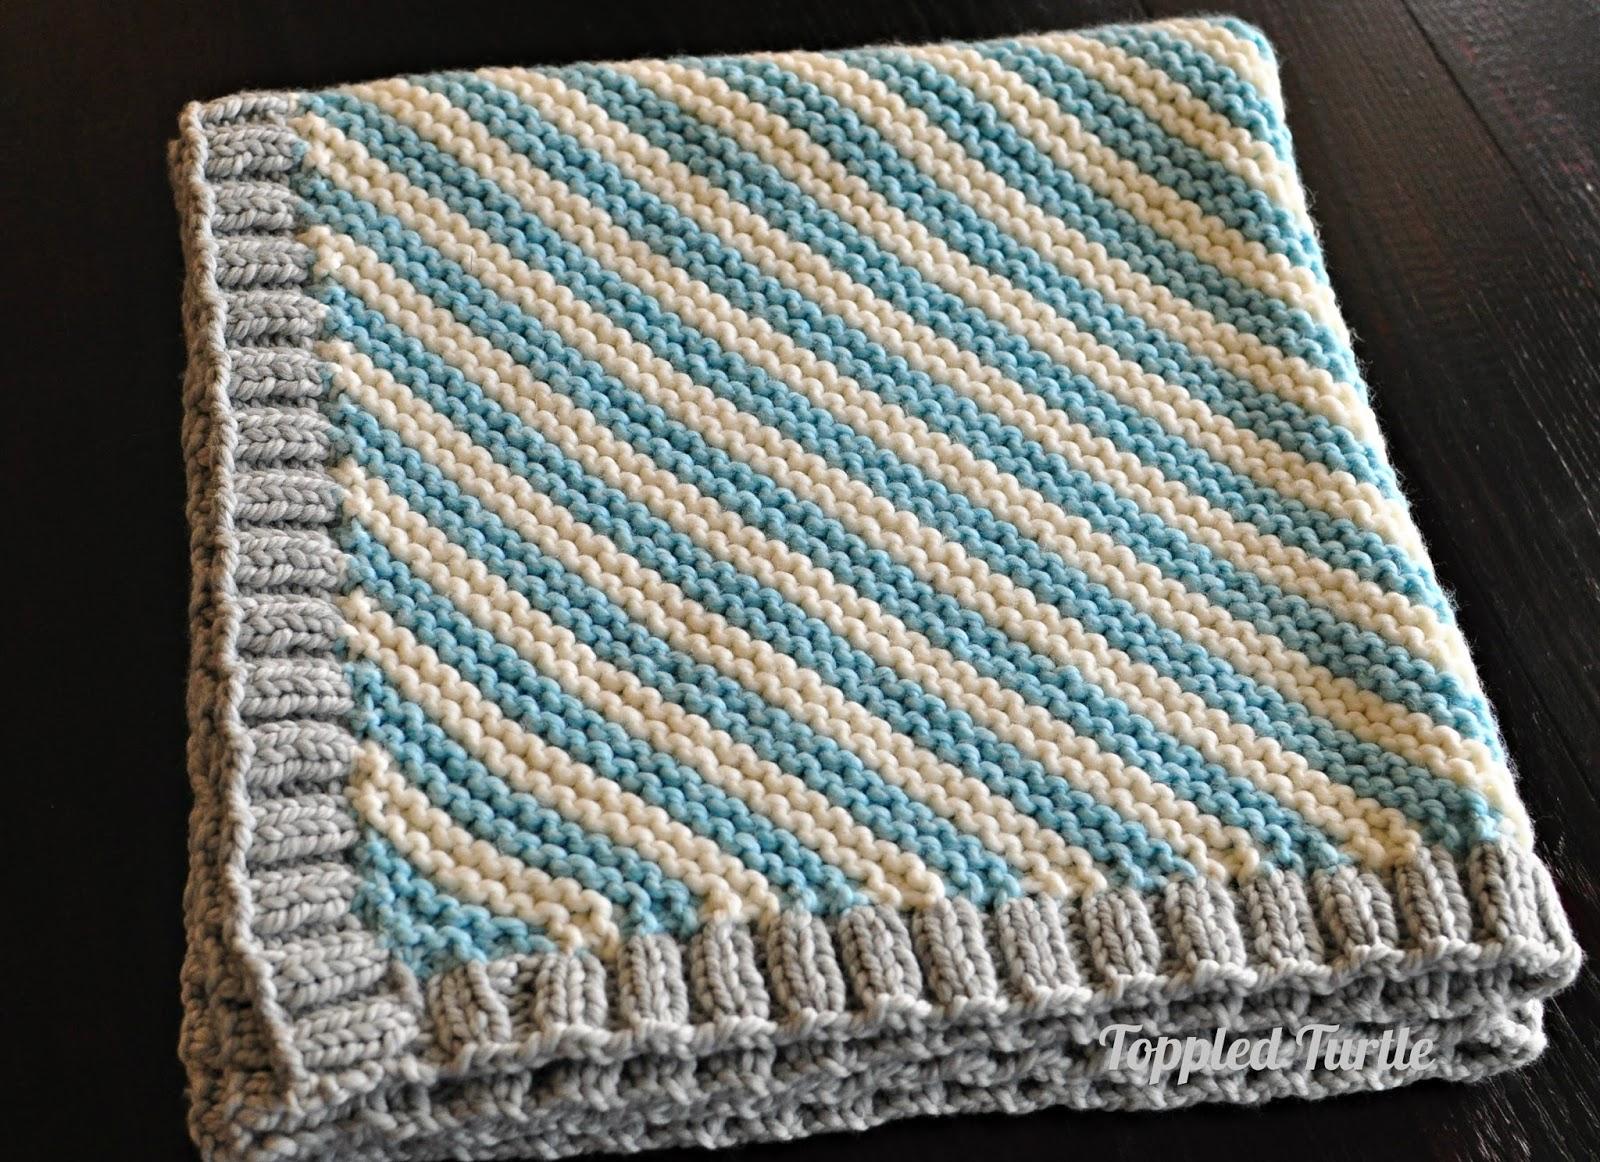 Toppled Turtle Bias Striped Knit Baby Blanket Free Pattern